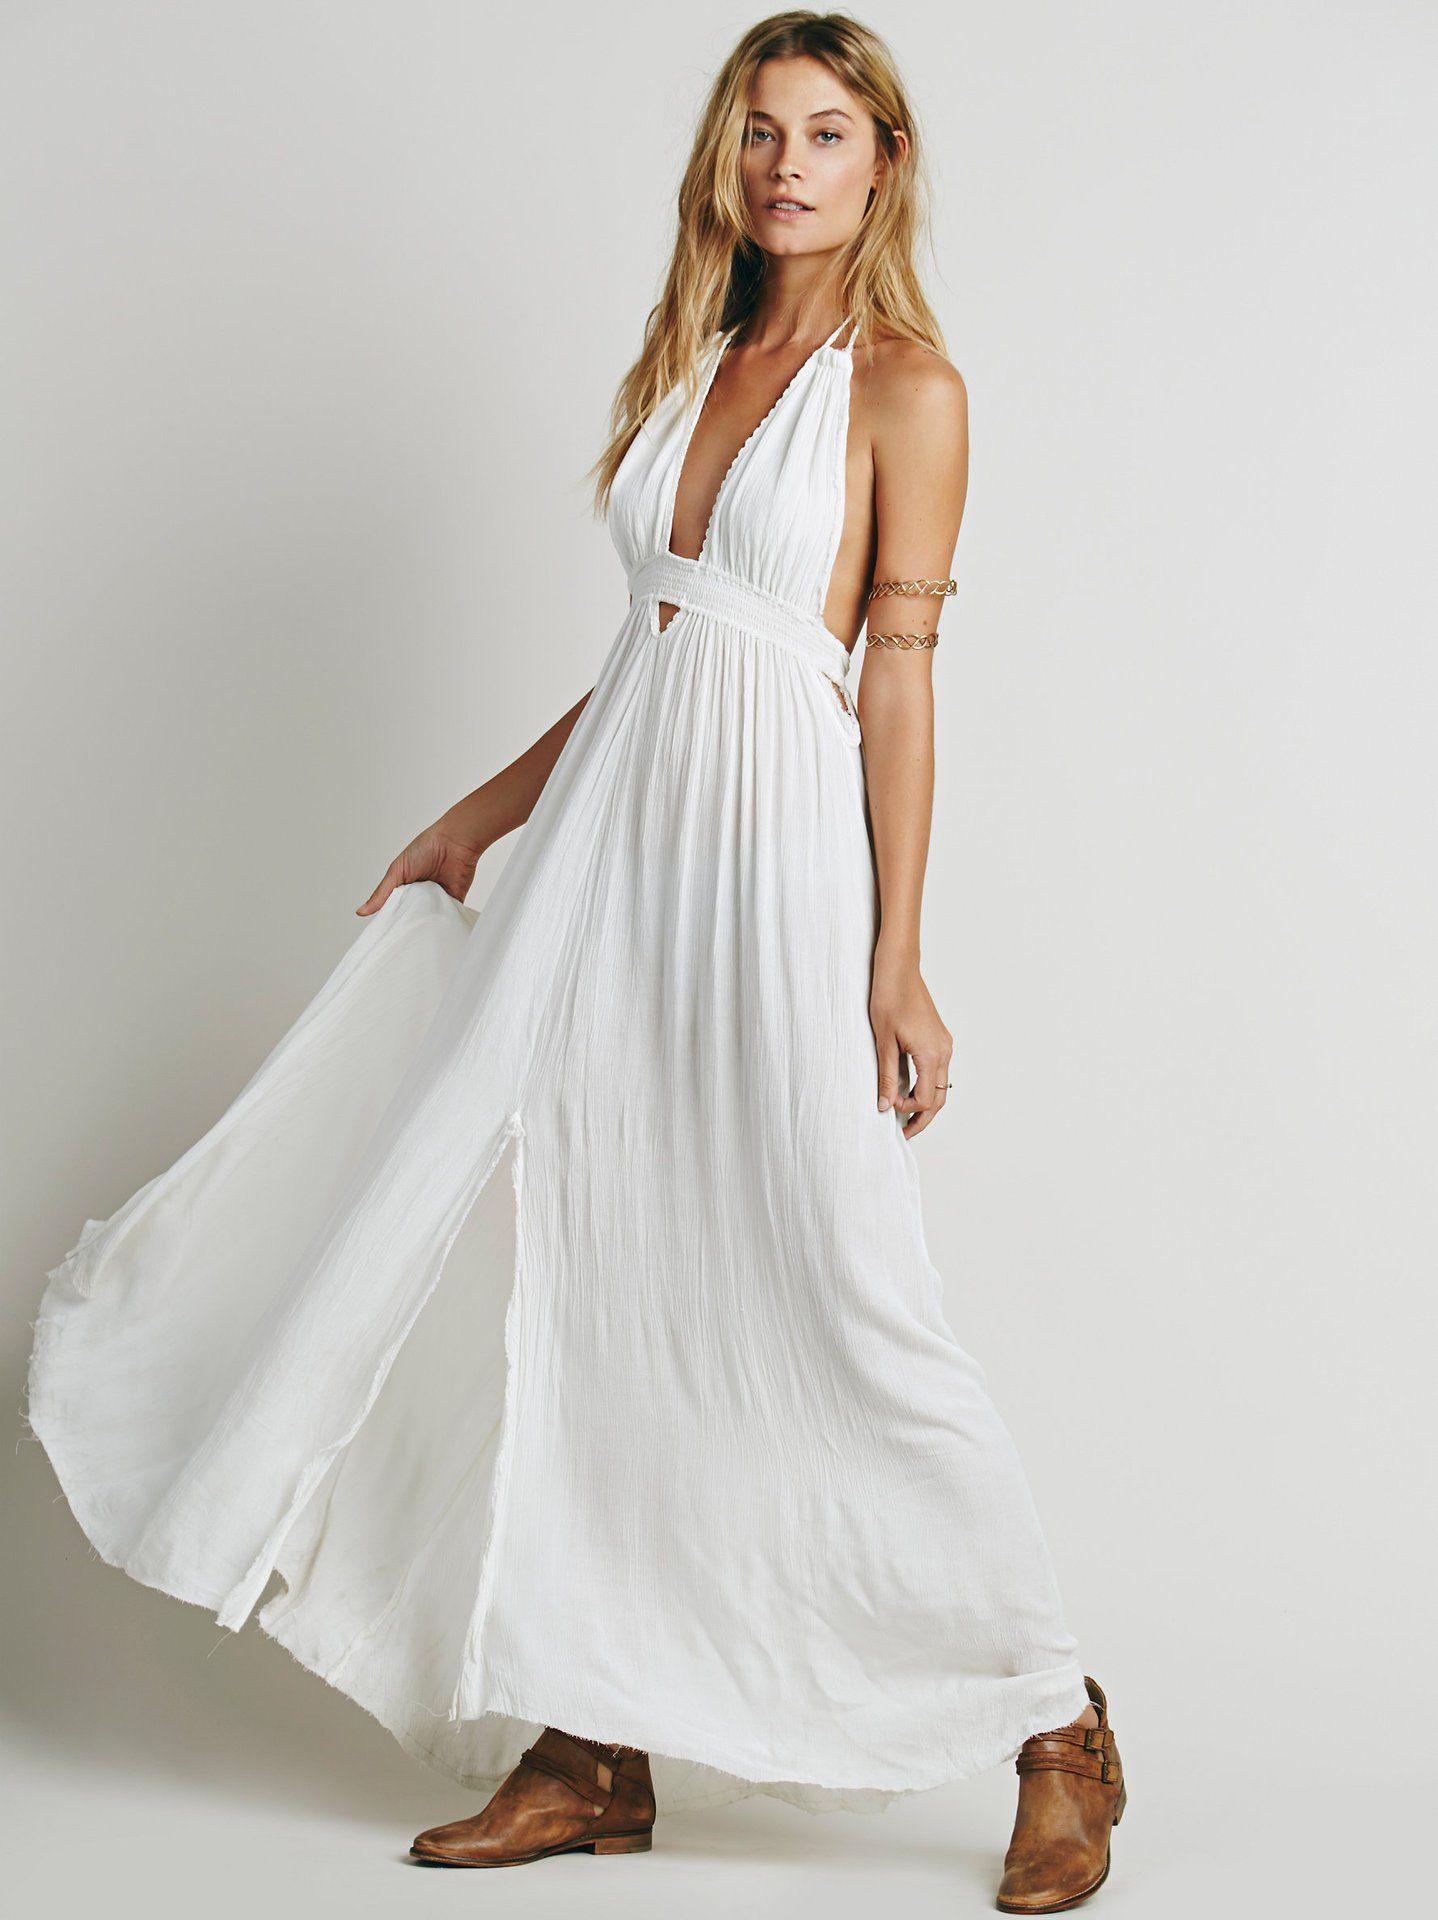 cd00eb30e11 Maxi Dresses Backless Halter Neck with Tassel Tie Sexy Dress Summer Boho  Beach Vestidos